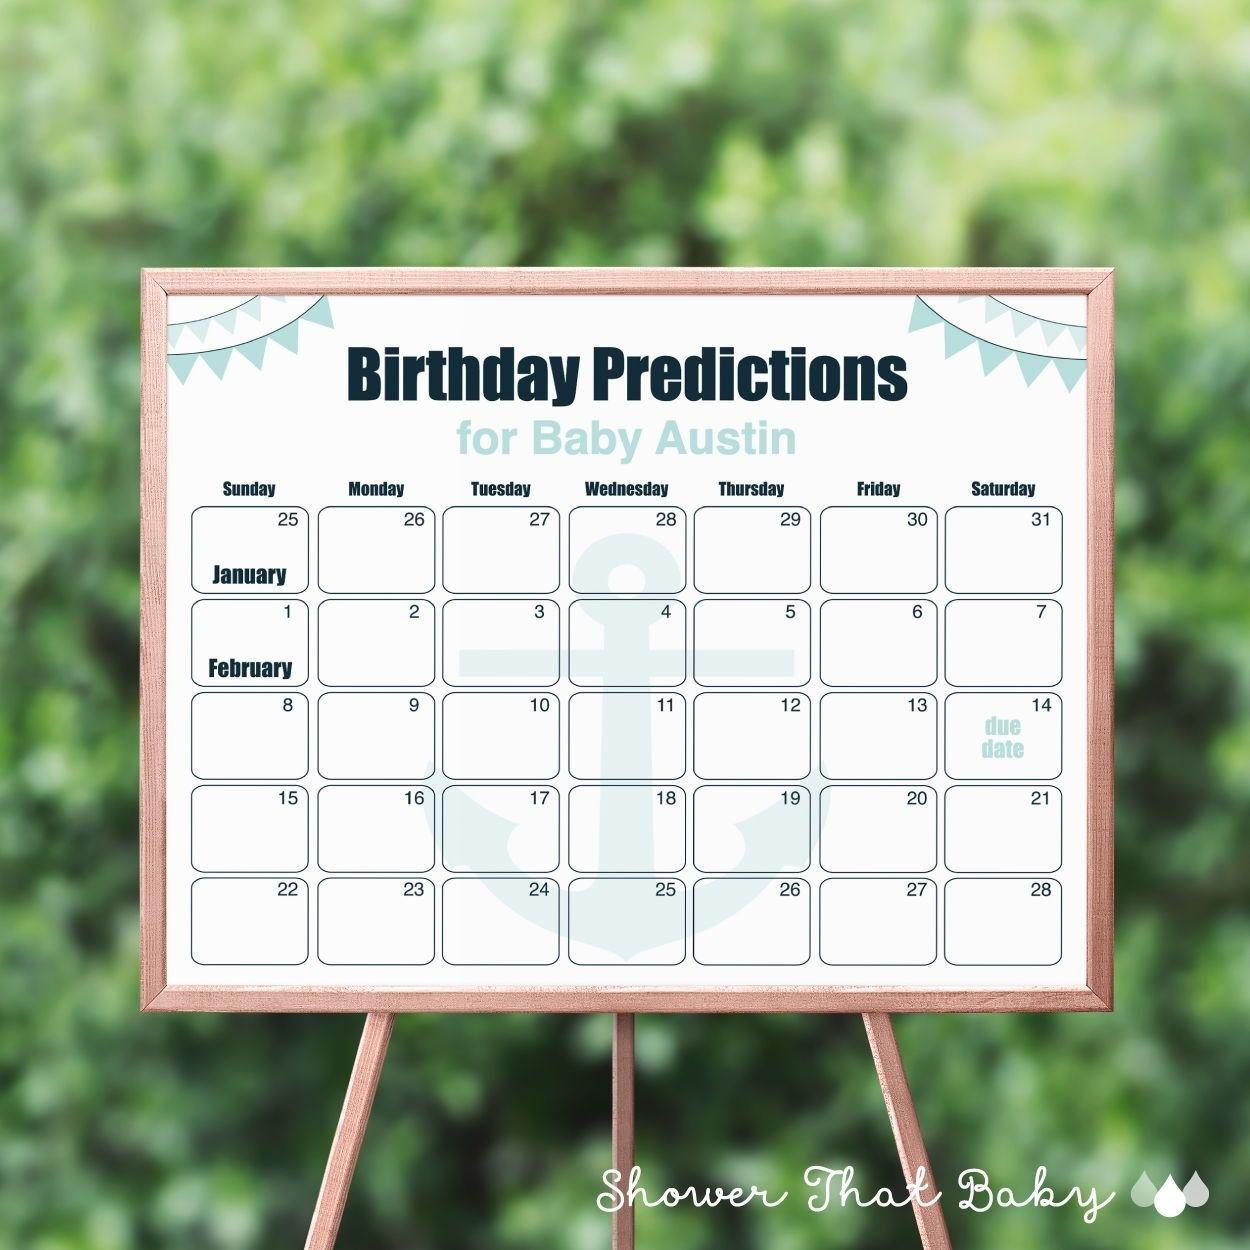 Nautical Birthday Prediction Calendar - Printable Nautical